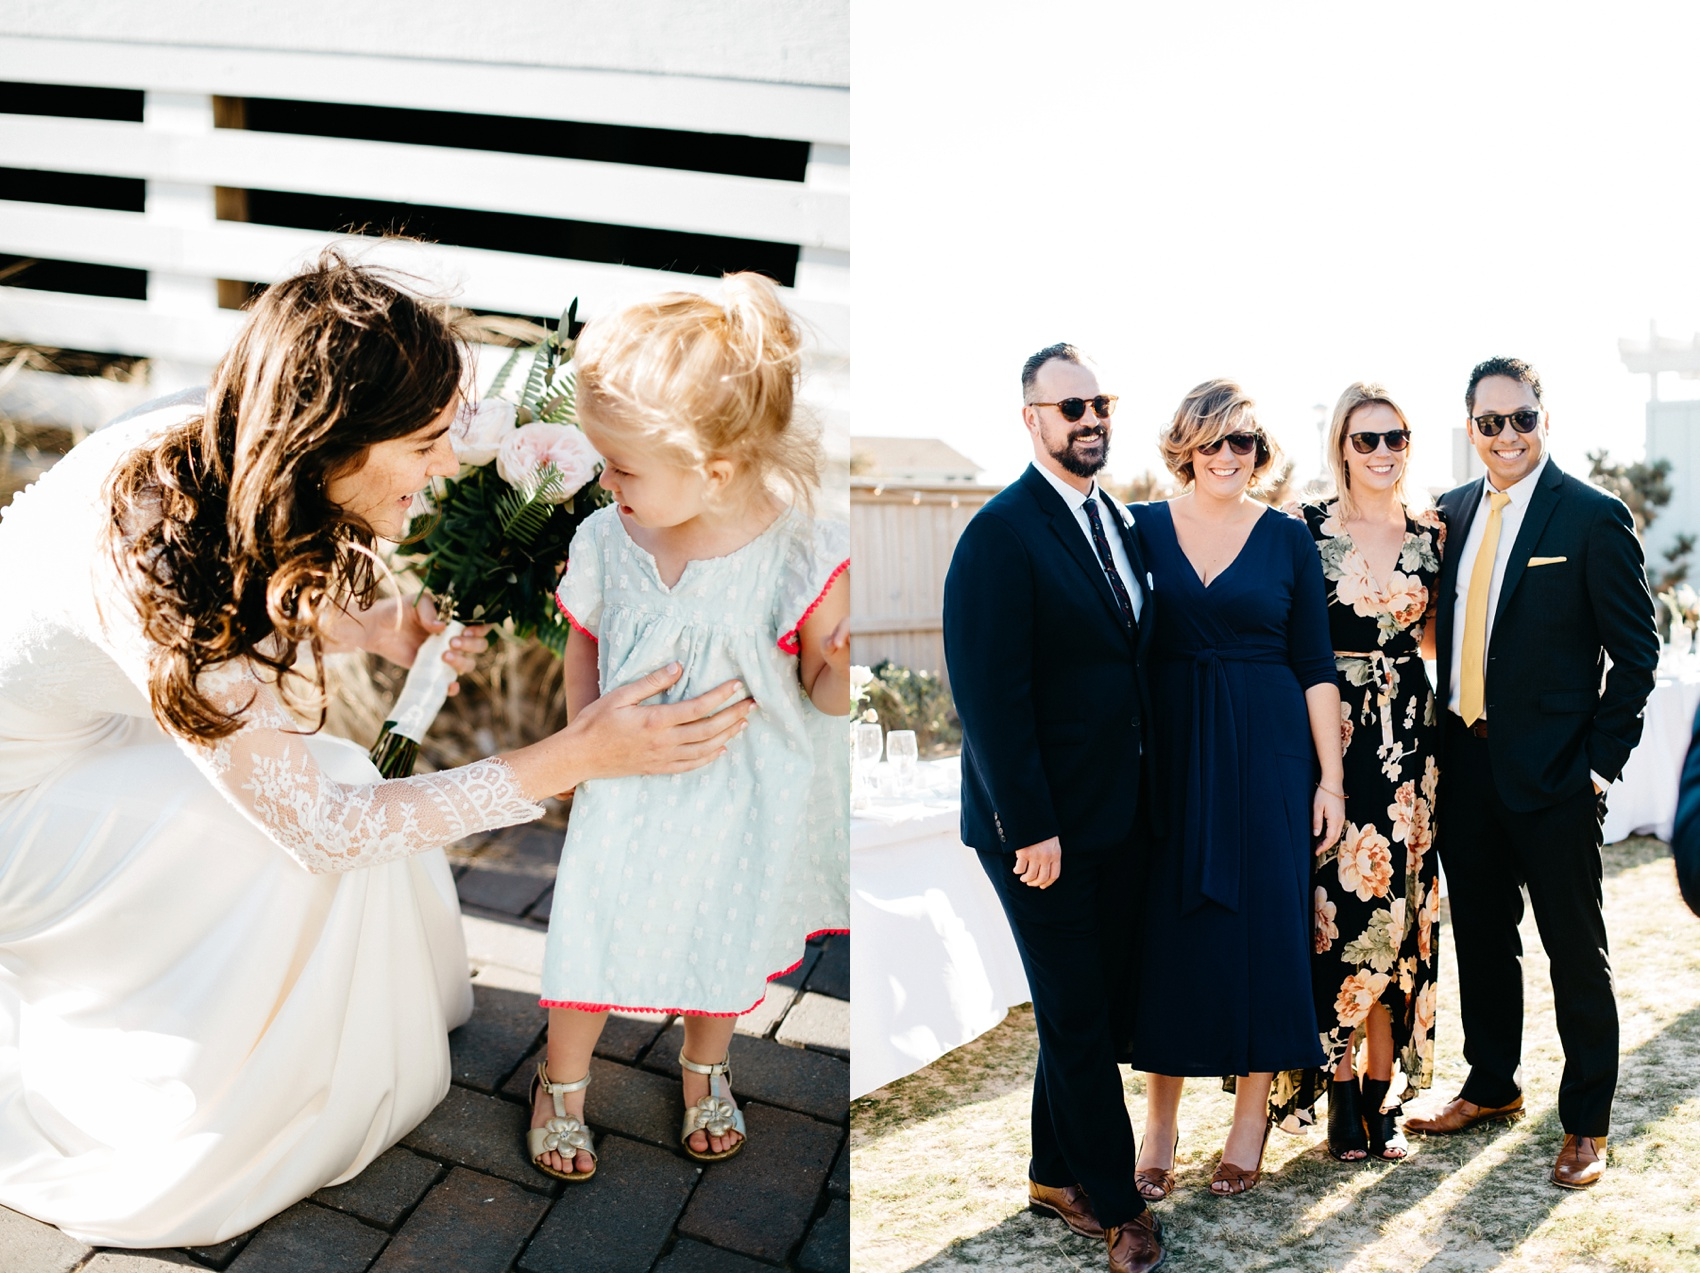 outerbanks_wedding_photographer_1291.jpg